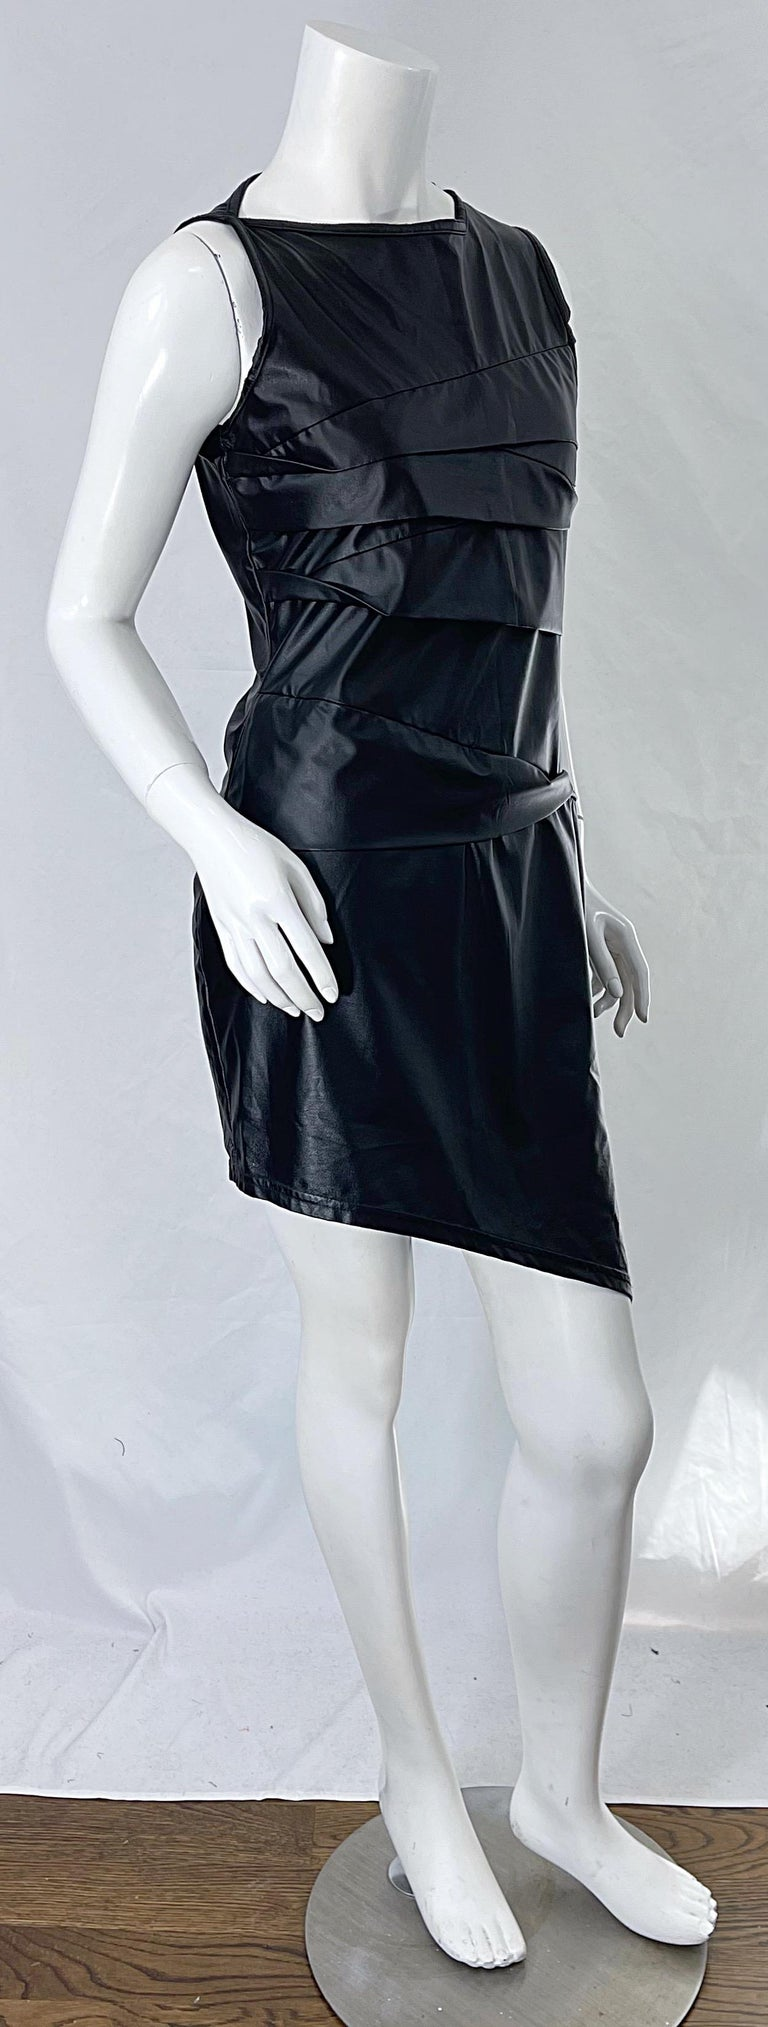 1990s Dexter Wong Club Kid Rave Japanese Black Pleather Vintage 90s Mini Dress For Sale 8